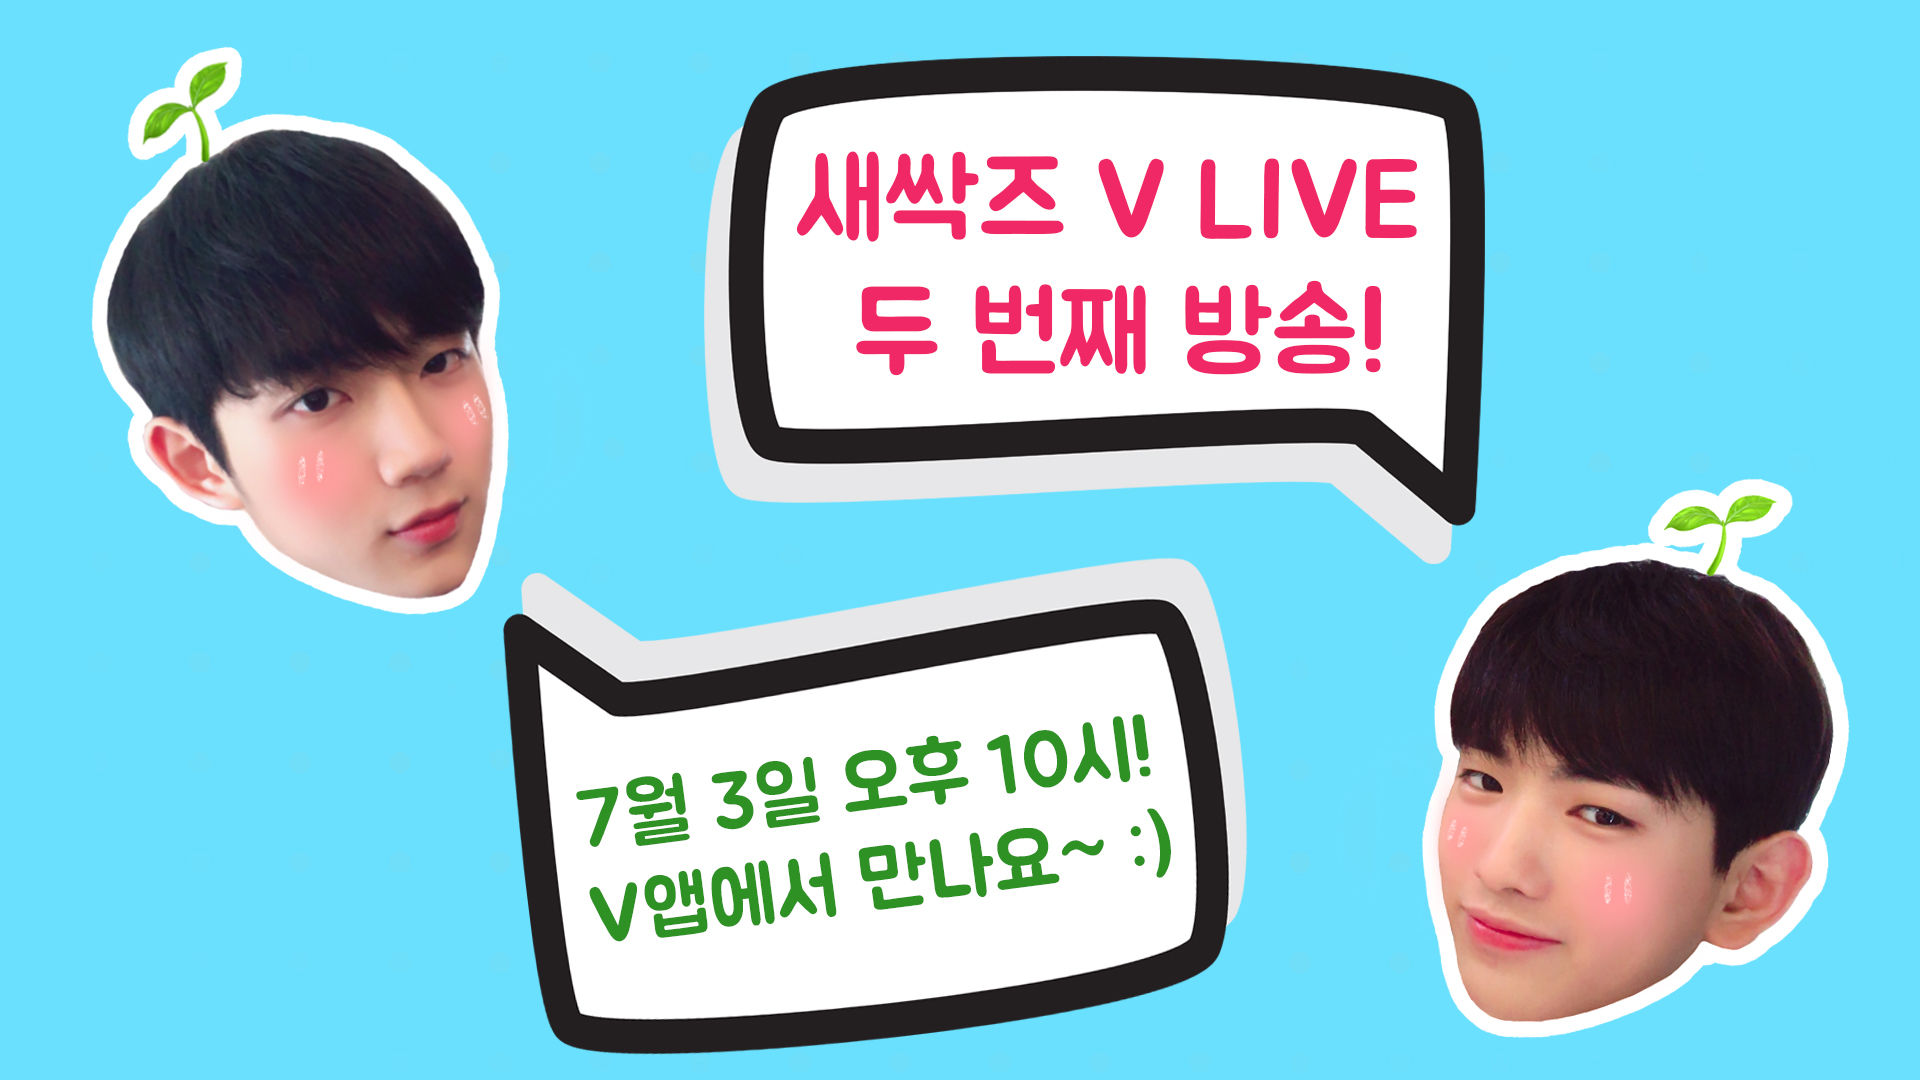 [#YH_NEXT] 🌱새싹즈🌱 V LIVE 두 번째 방송  💕